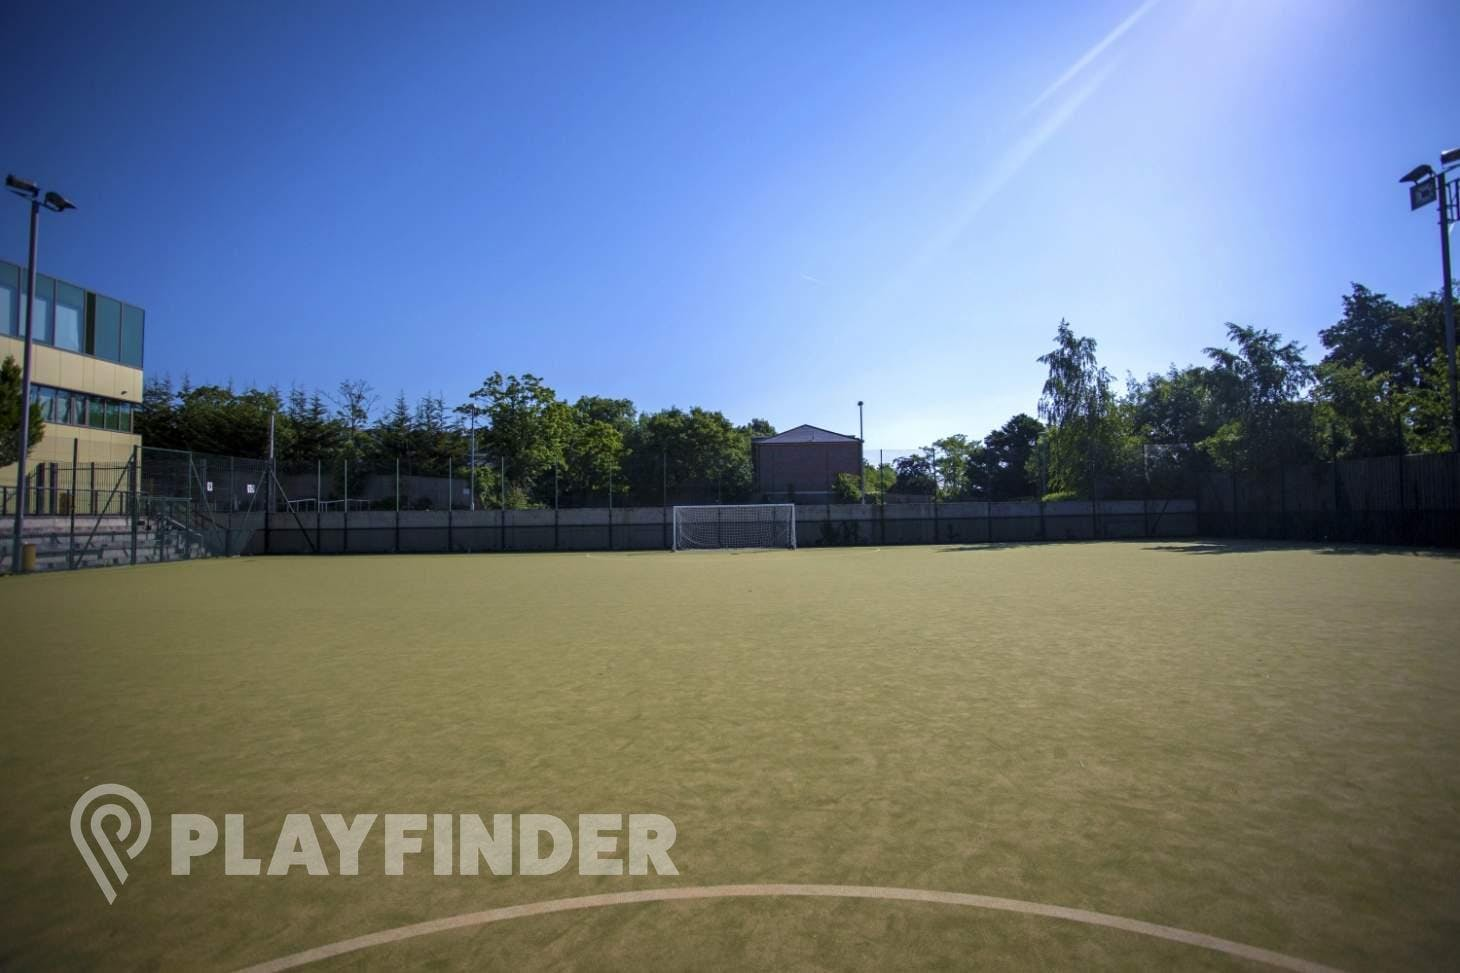 Elmgreen School 7 a side   Astroturf football pitch